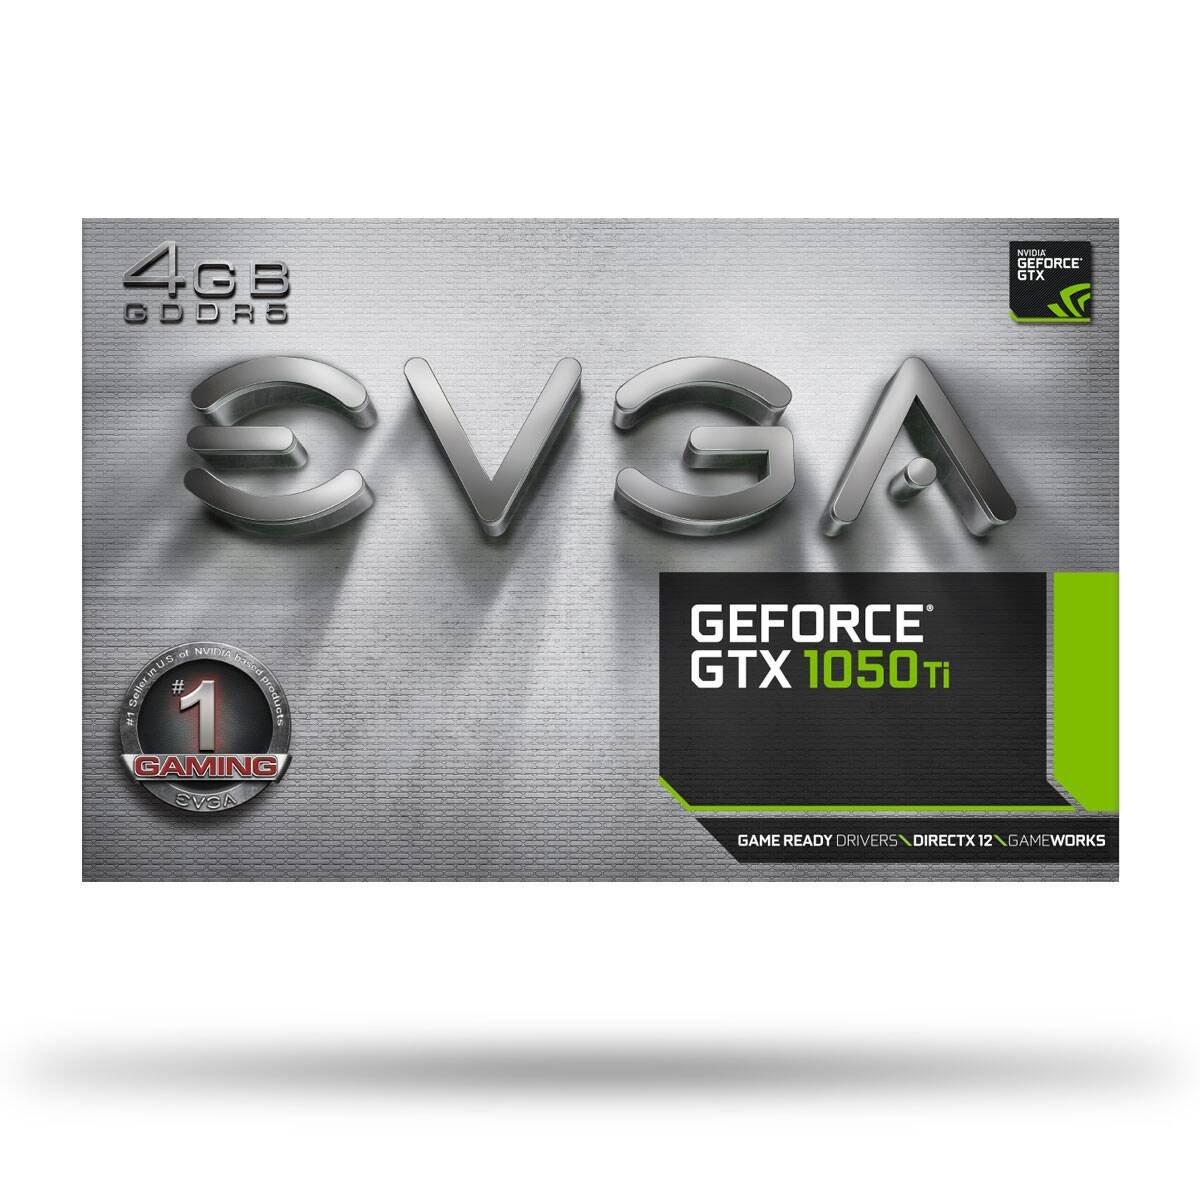 DX12 OSD 4 GB GDDR5 PXOC EVGA GeForce GTX 1050 Ti SSC Gaming ACX 3.0 Tarjeta Grafica 04G-P4-6255-KR